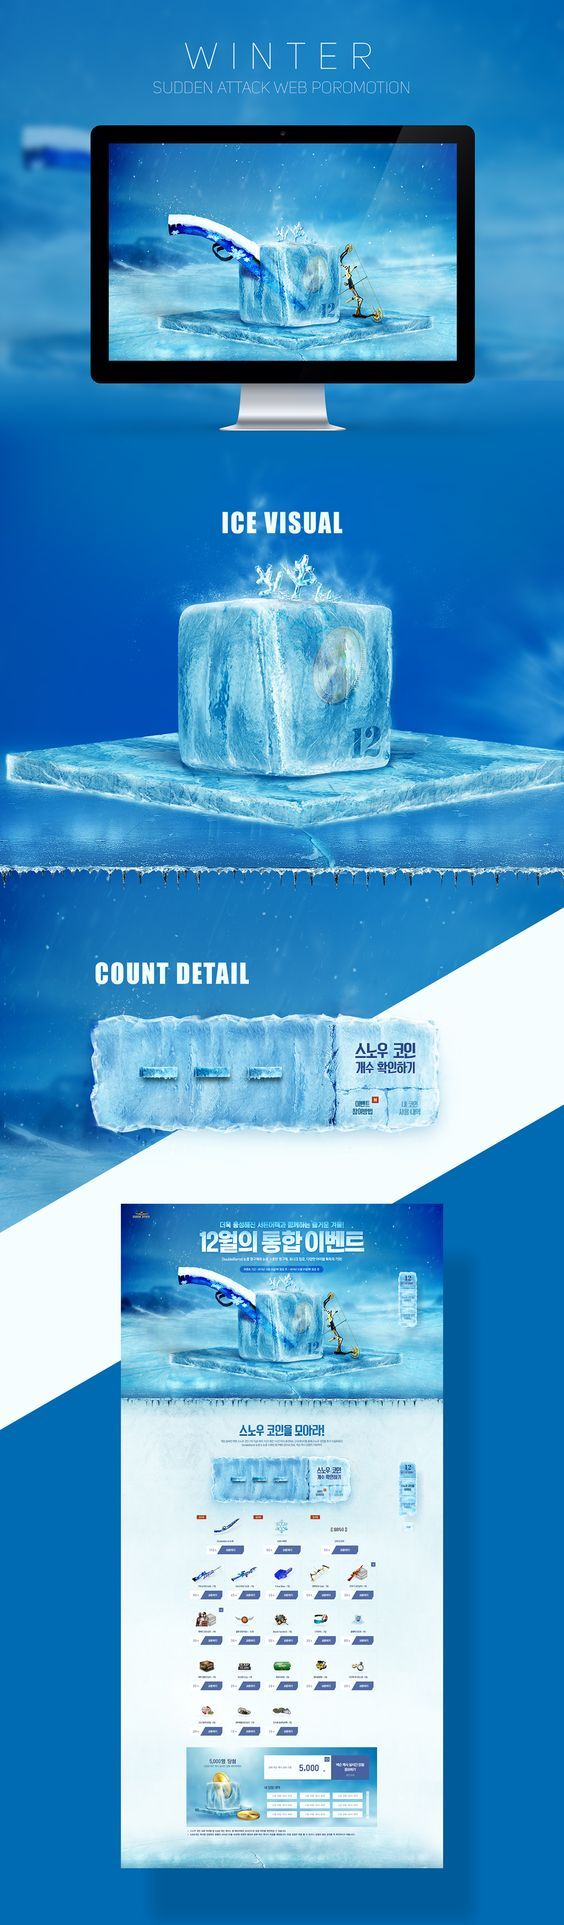 Ice cube theme website concept #inspirtion #visual #layout #ice #web #design